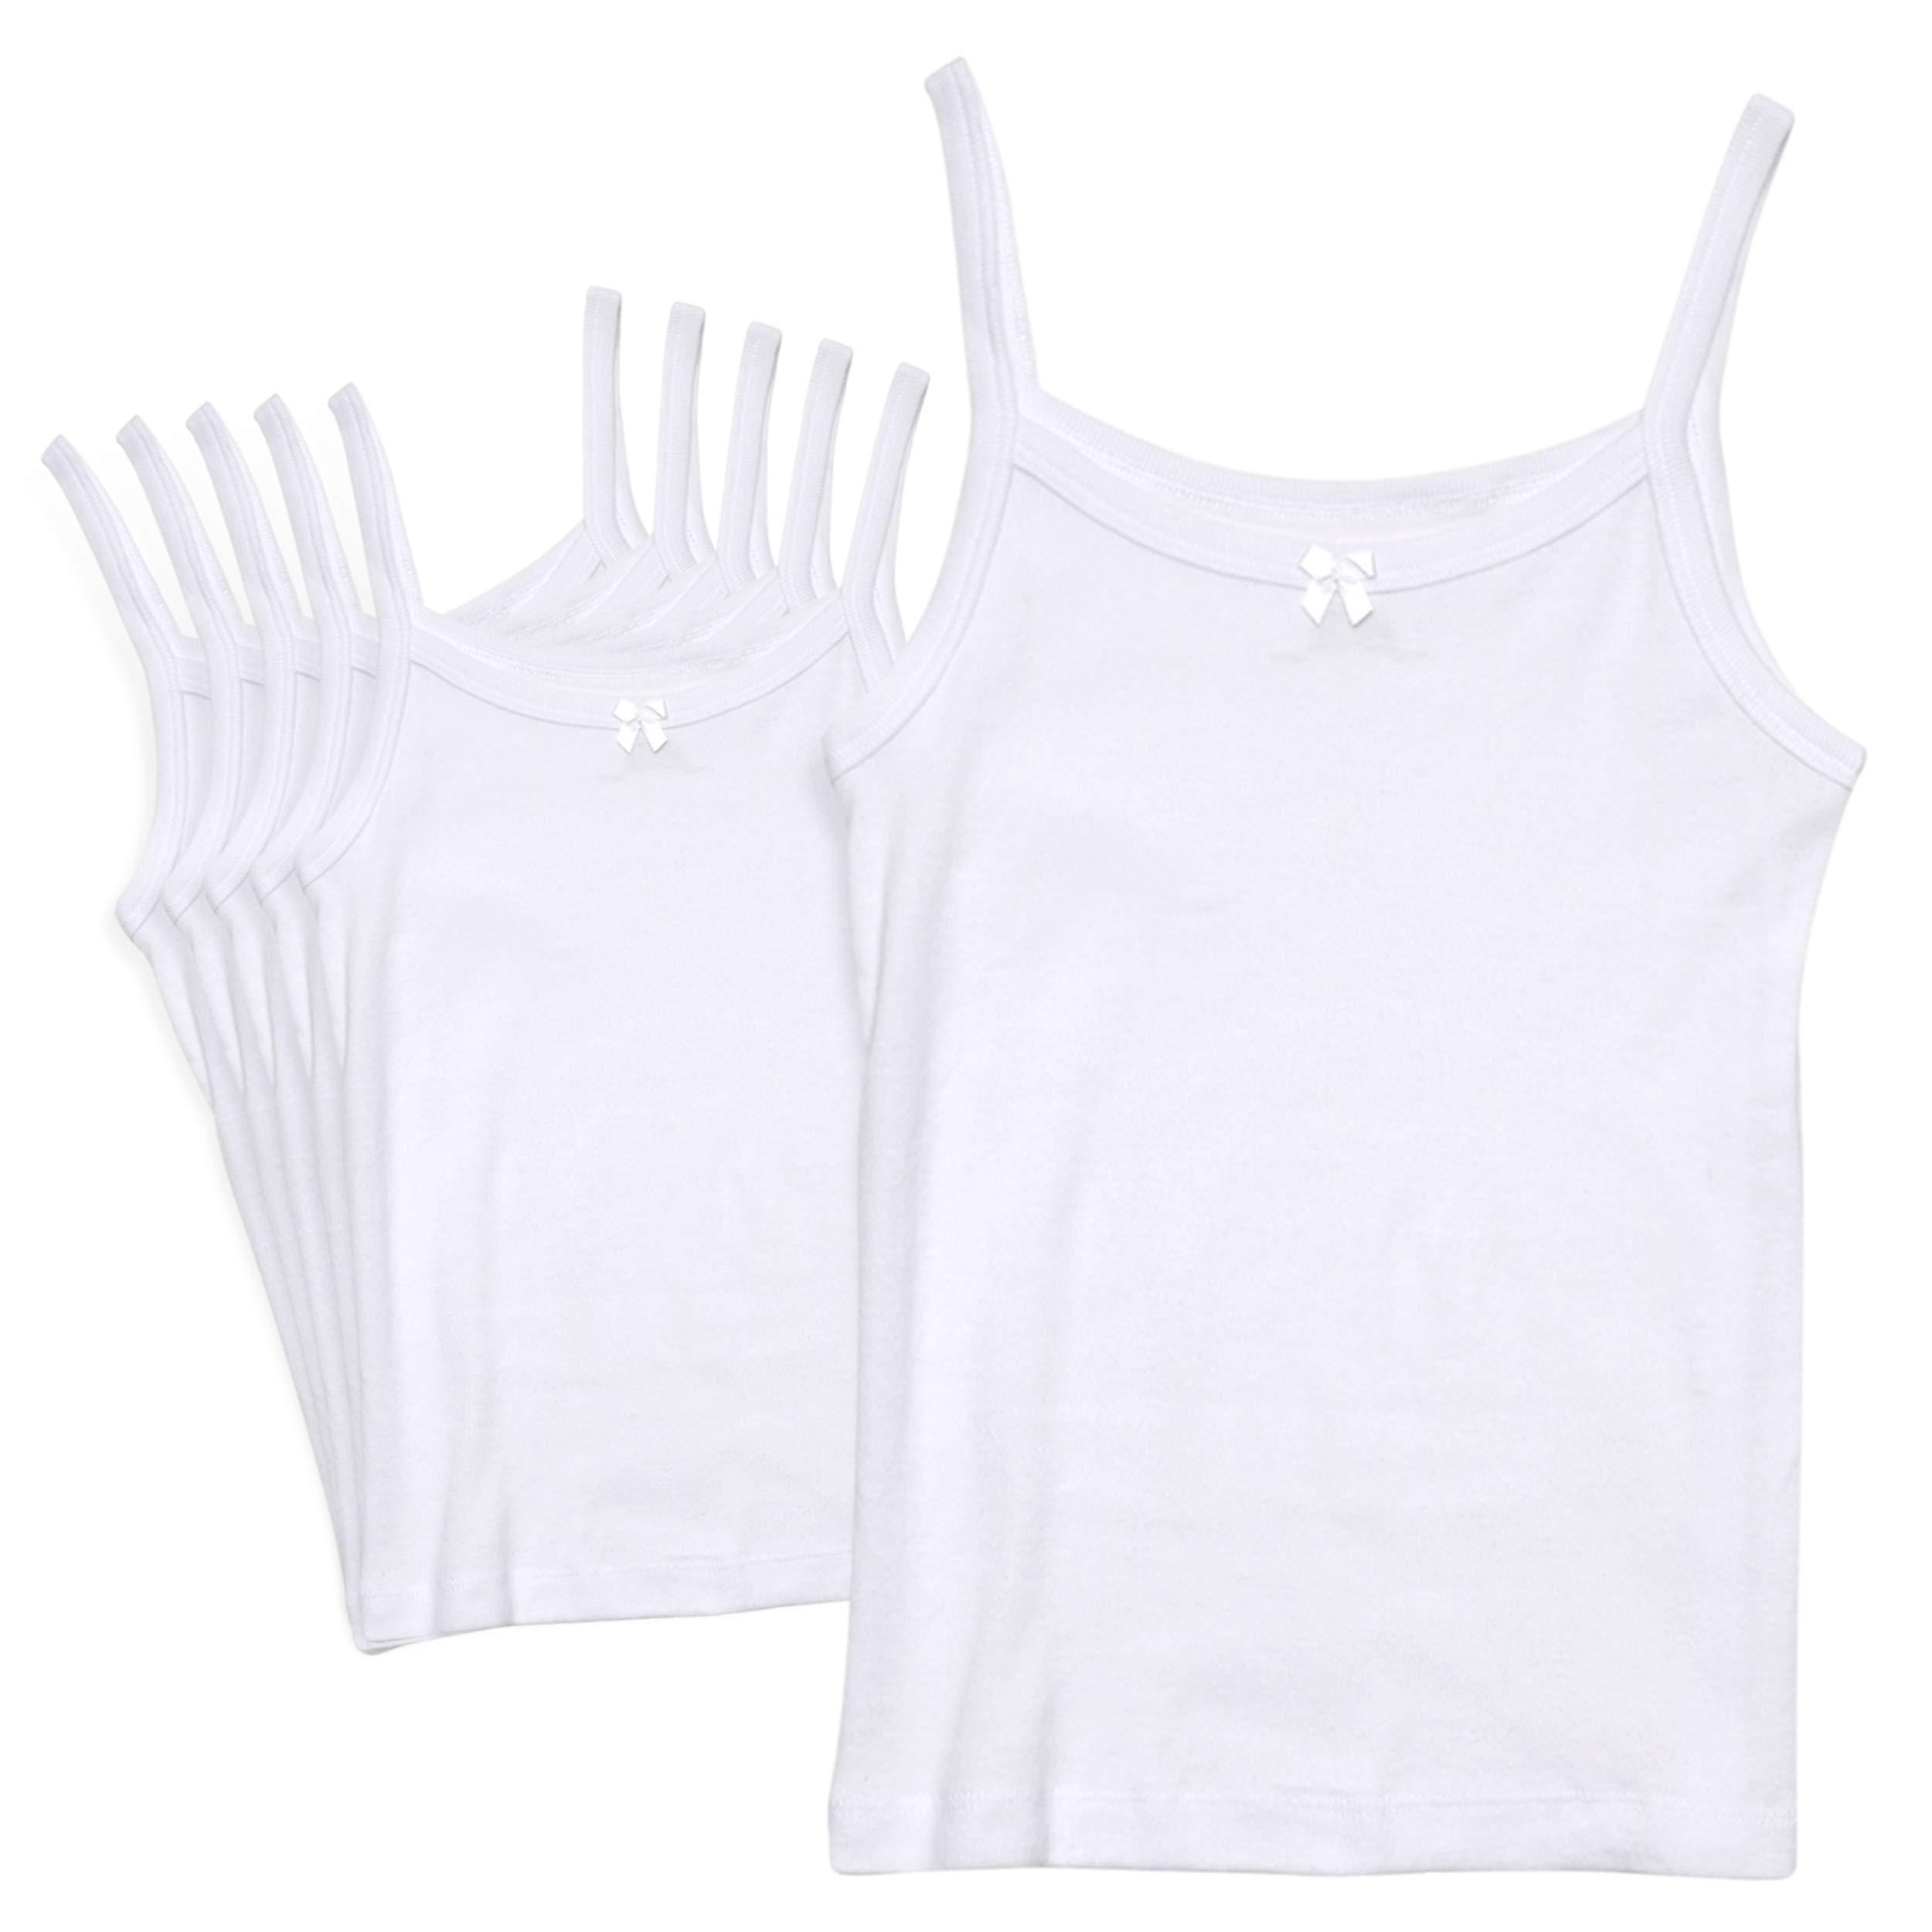 benetia Girls Undershirts Cotton KidsTank 3-Pack